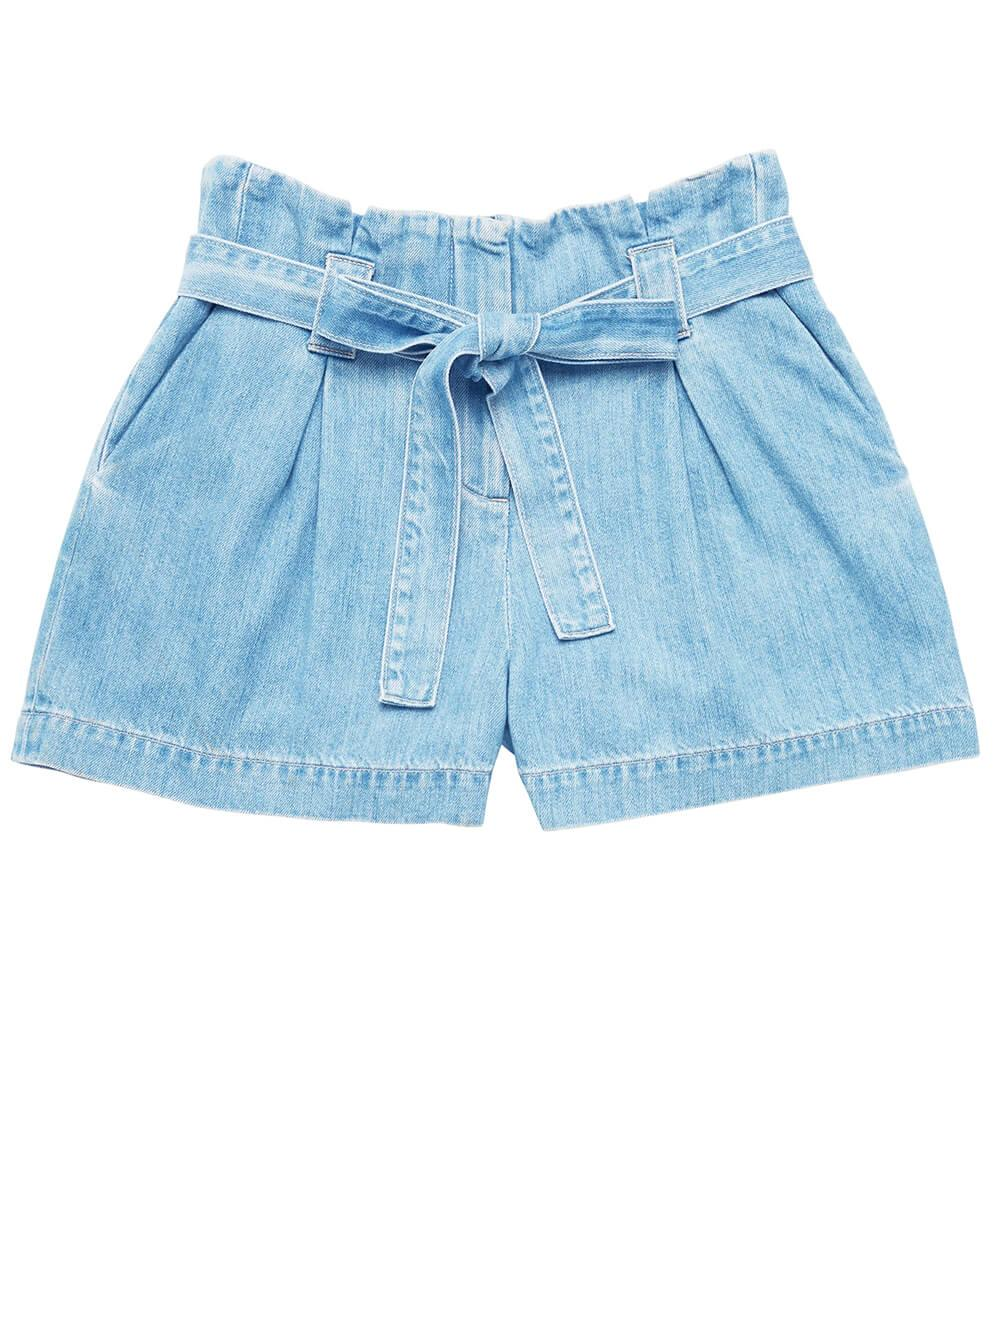 Hillary Paperbag Shorts Item # 2636KDS